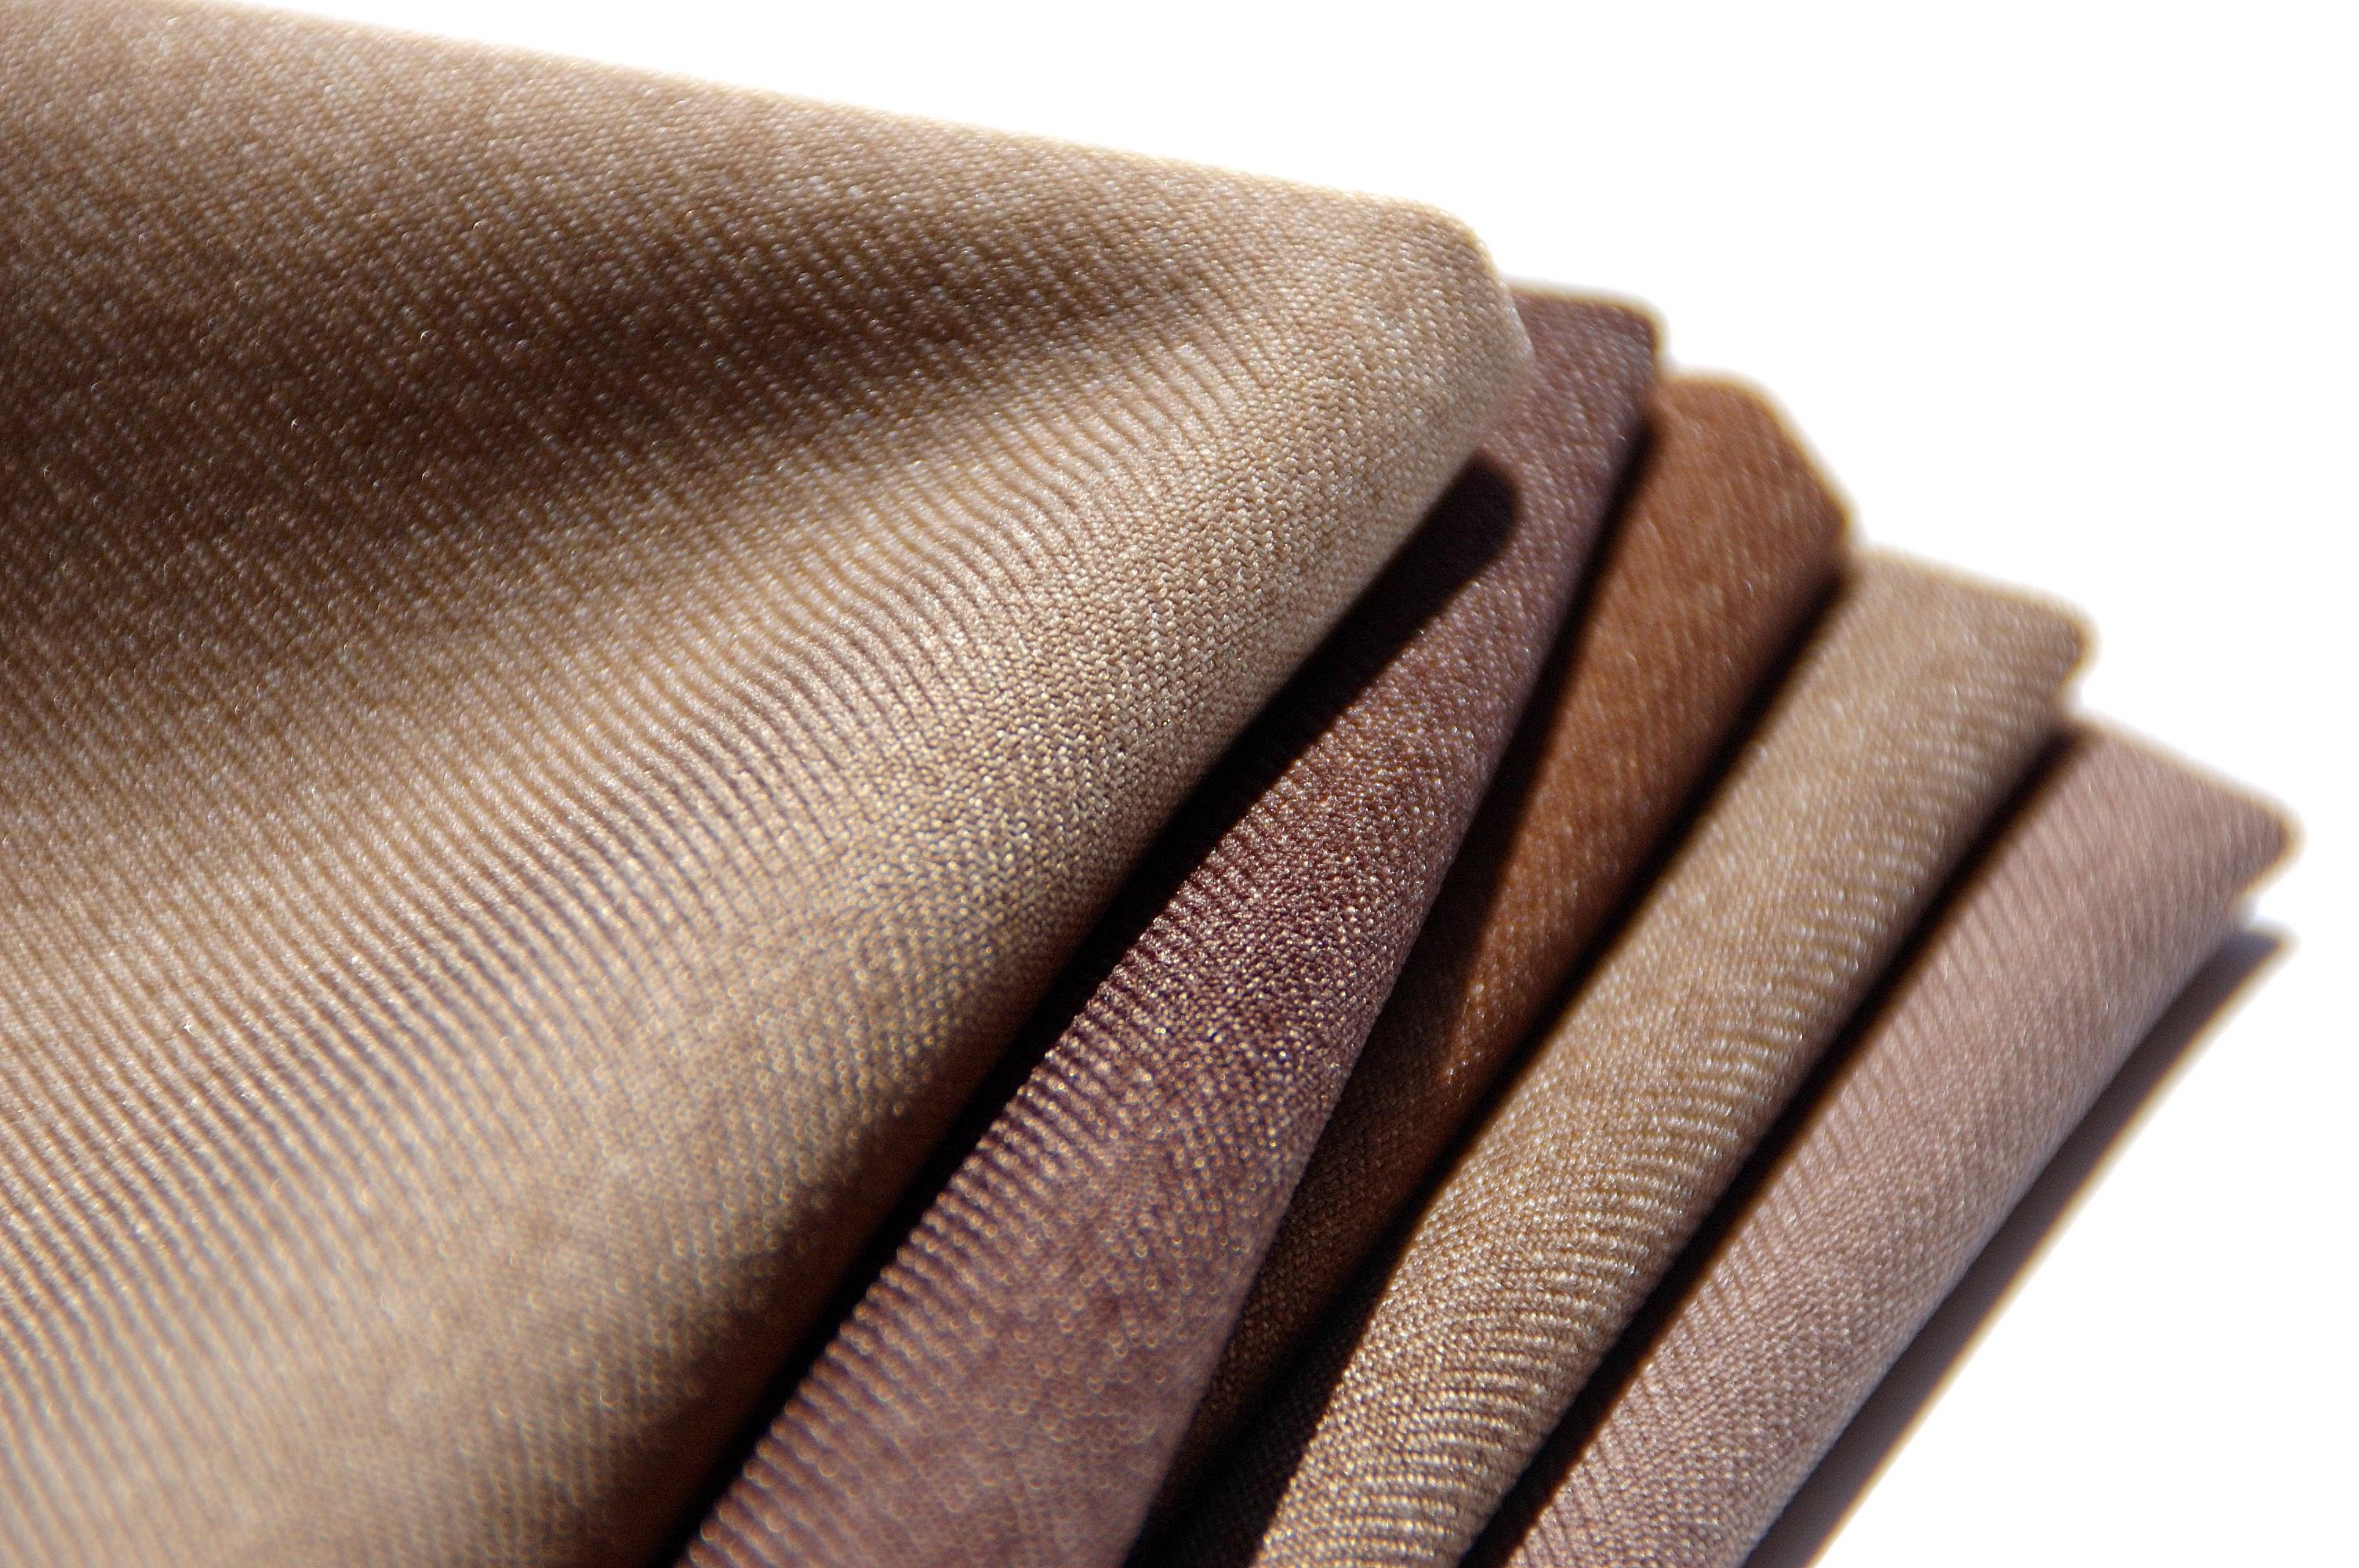 Bespoke contract drapery fabric